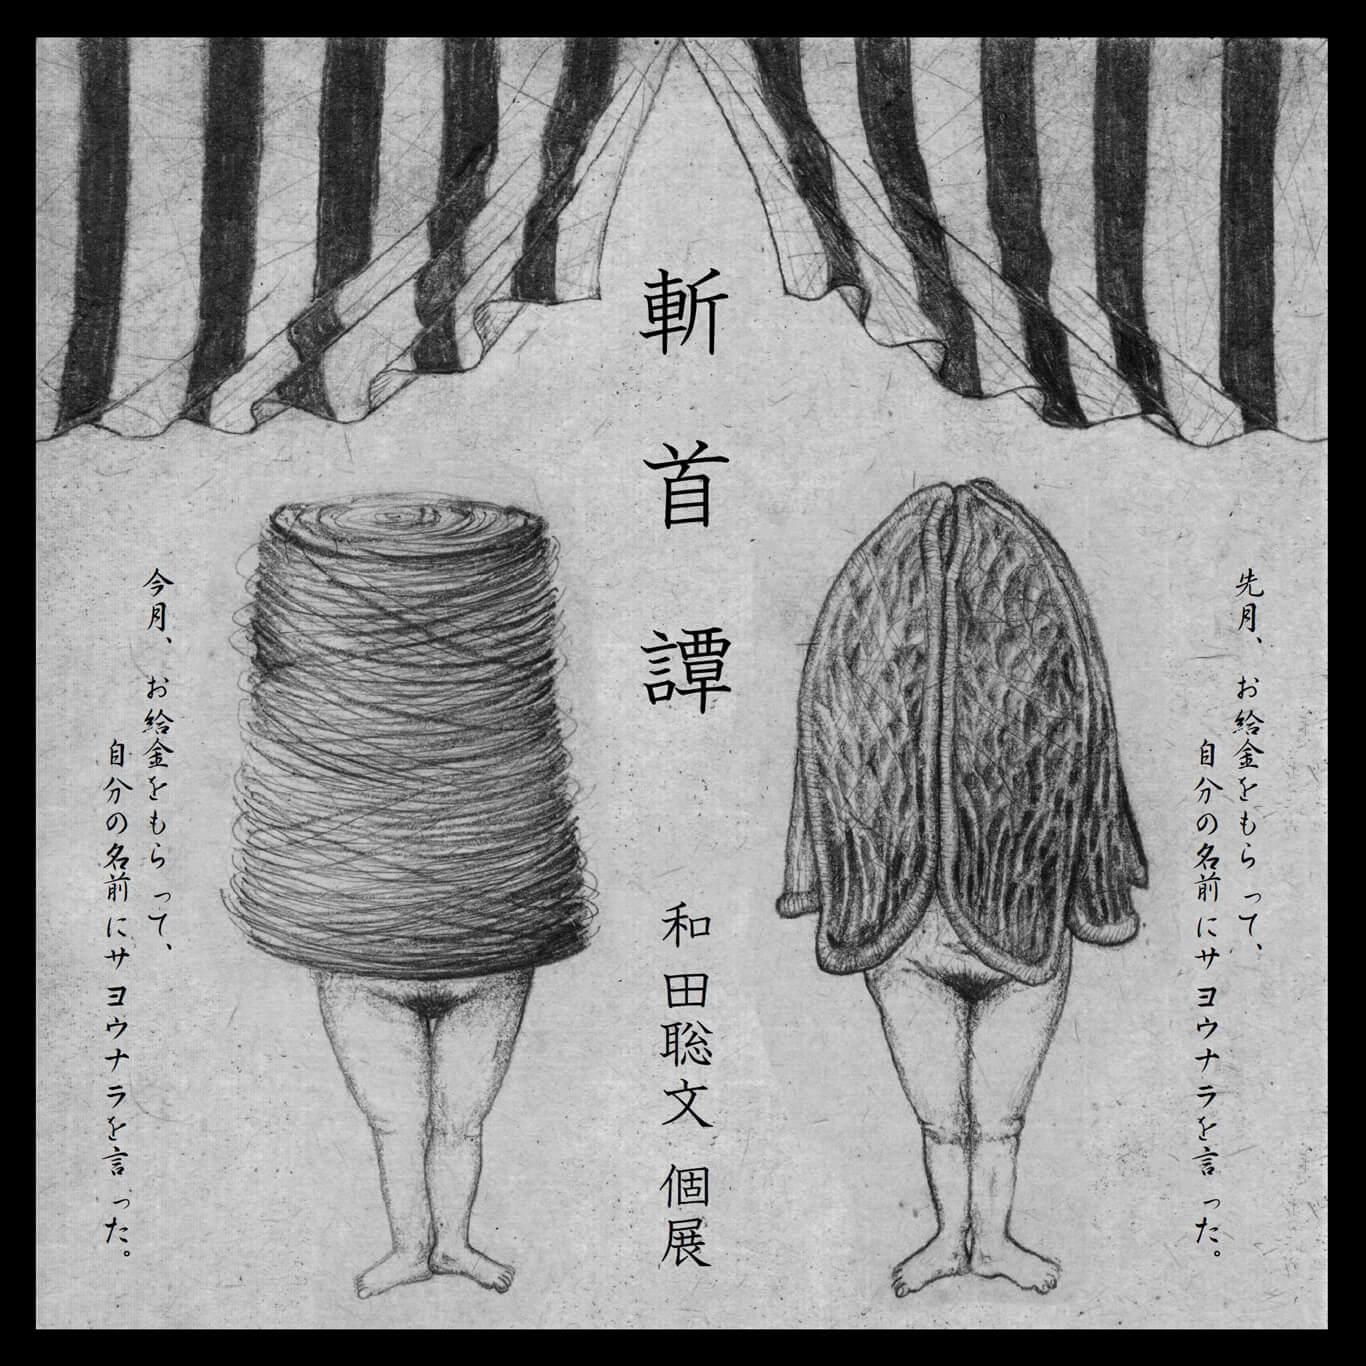 iaf-201907-和田聡文-展覧会